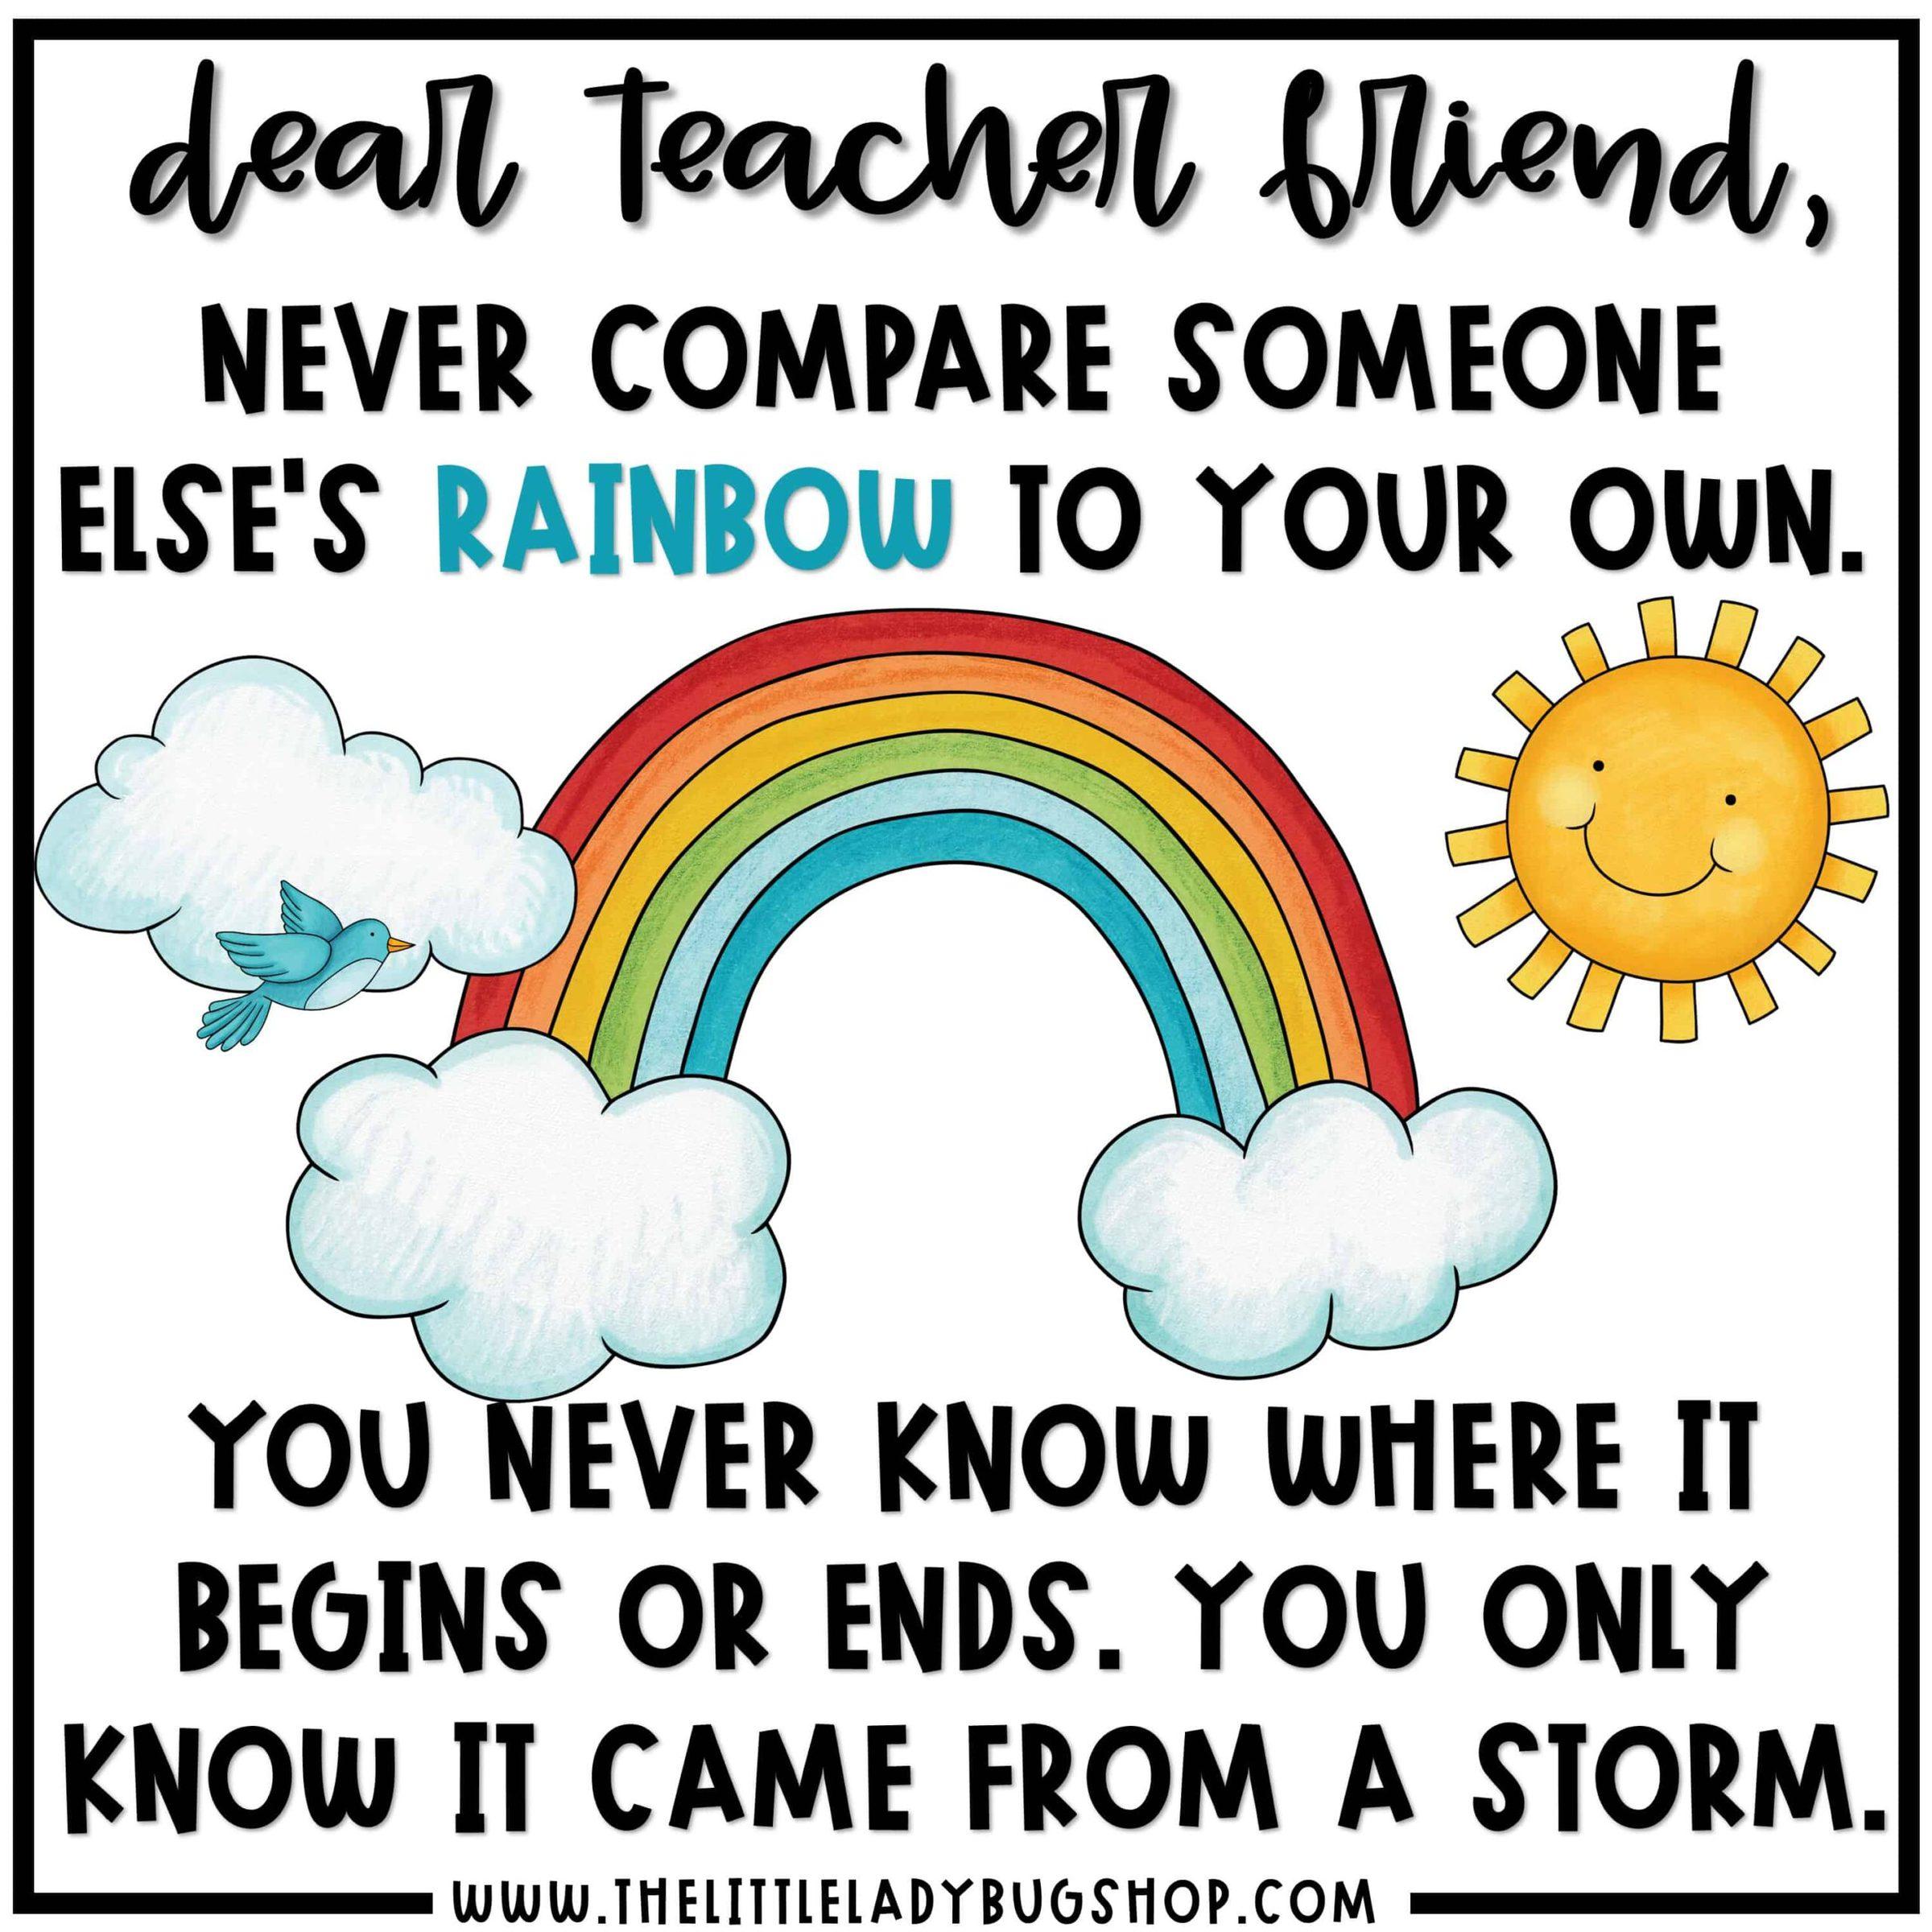 Dear Teacher Friend, do not compare yourself. Teacher Quotes